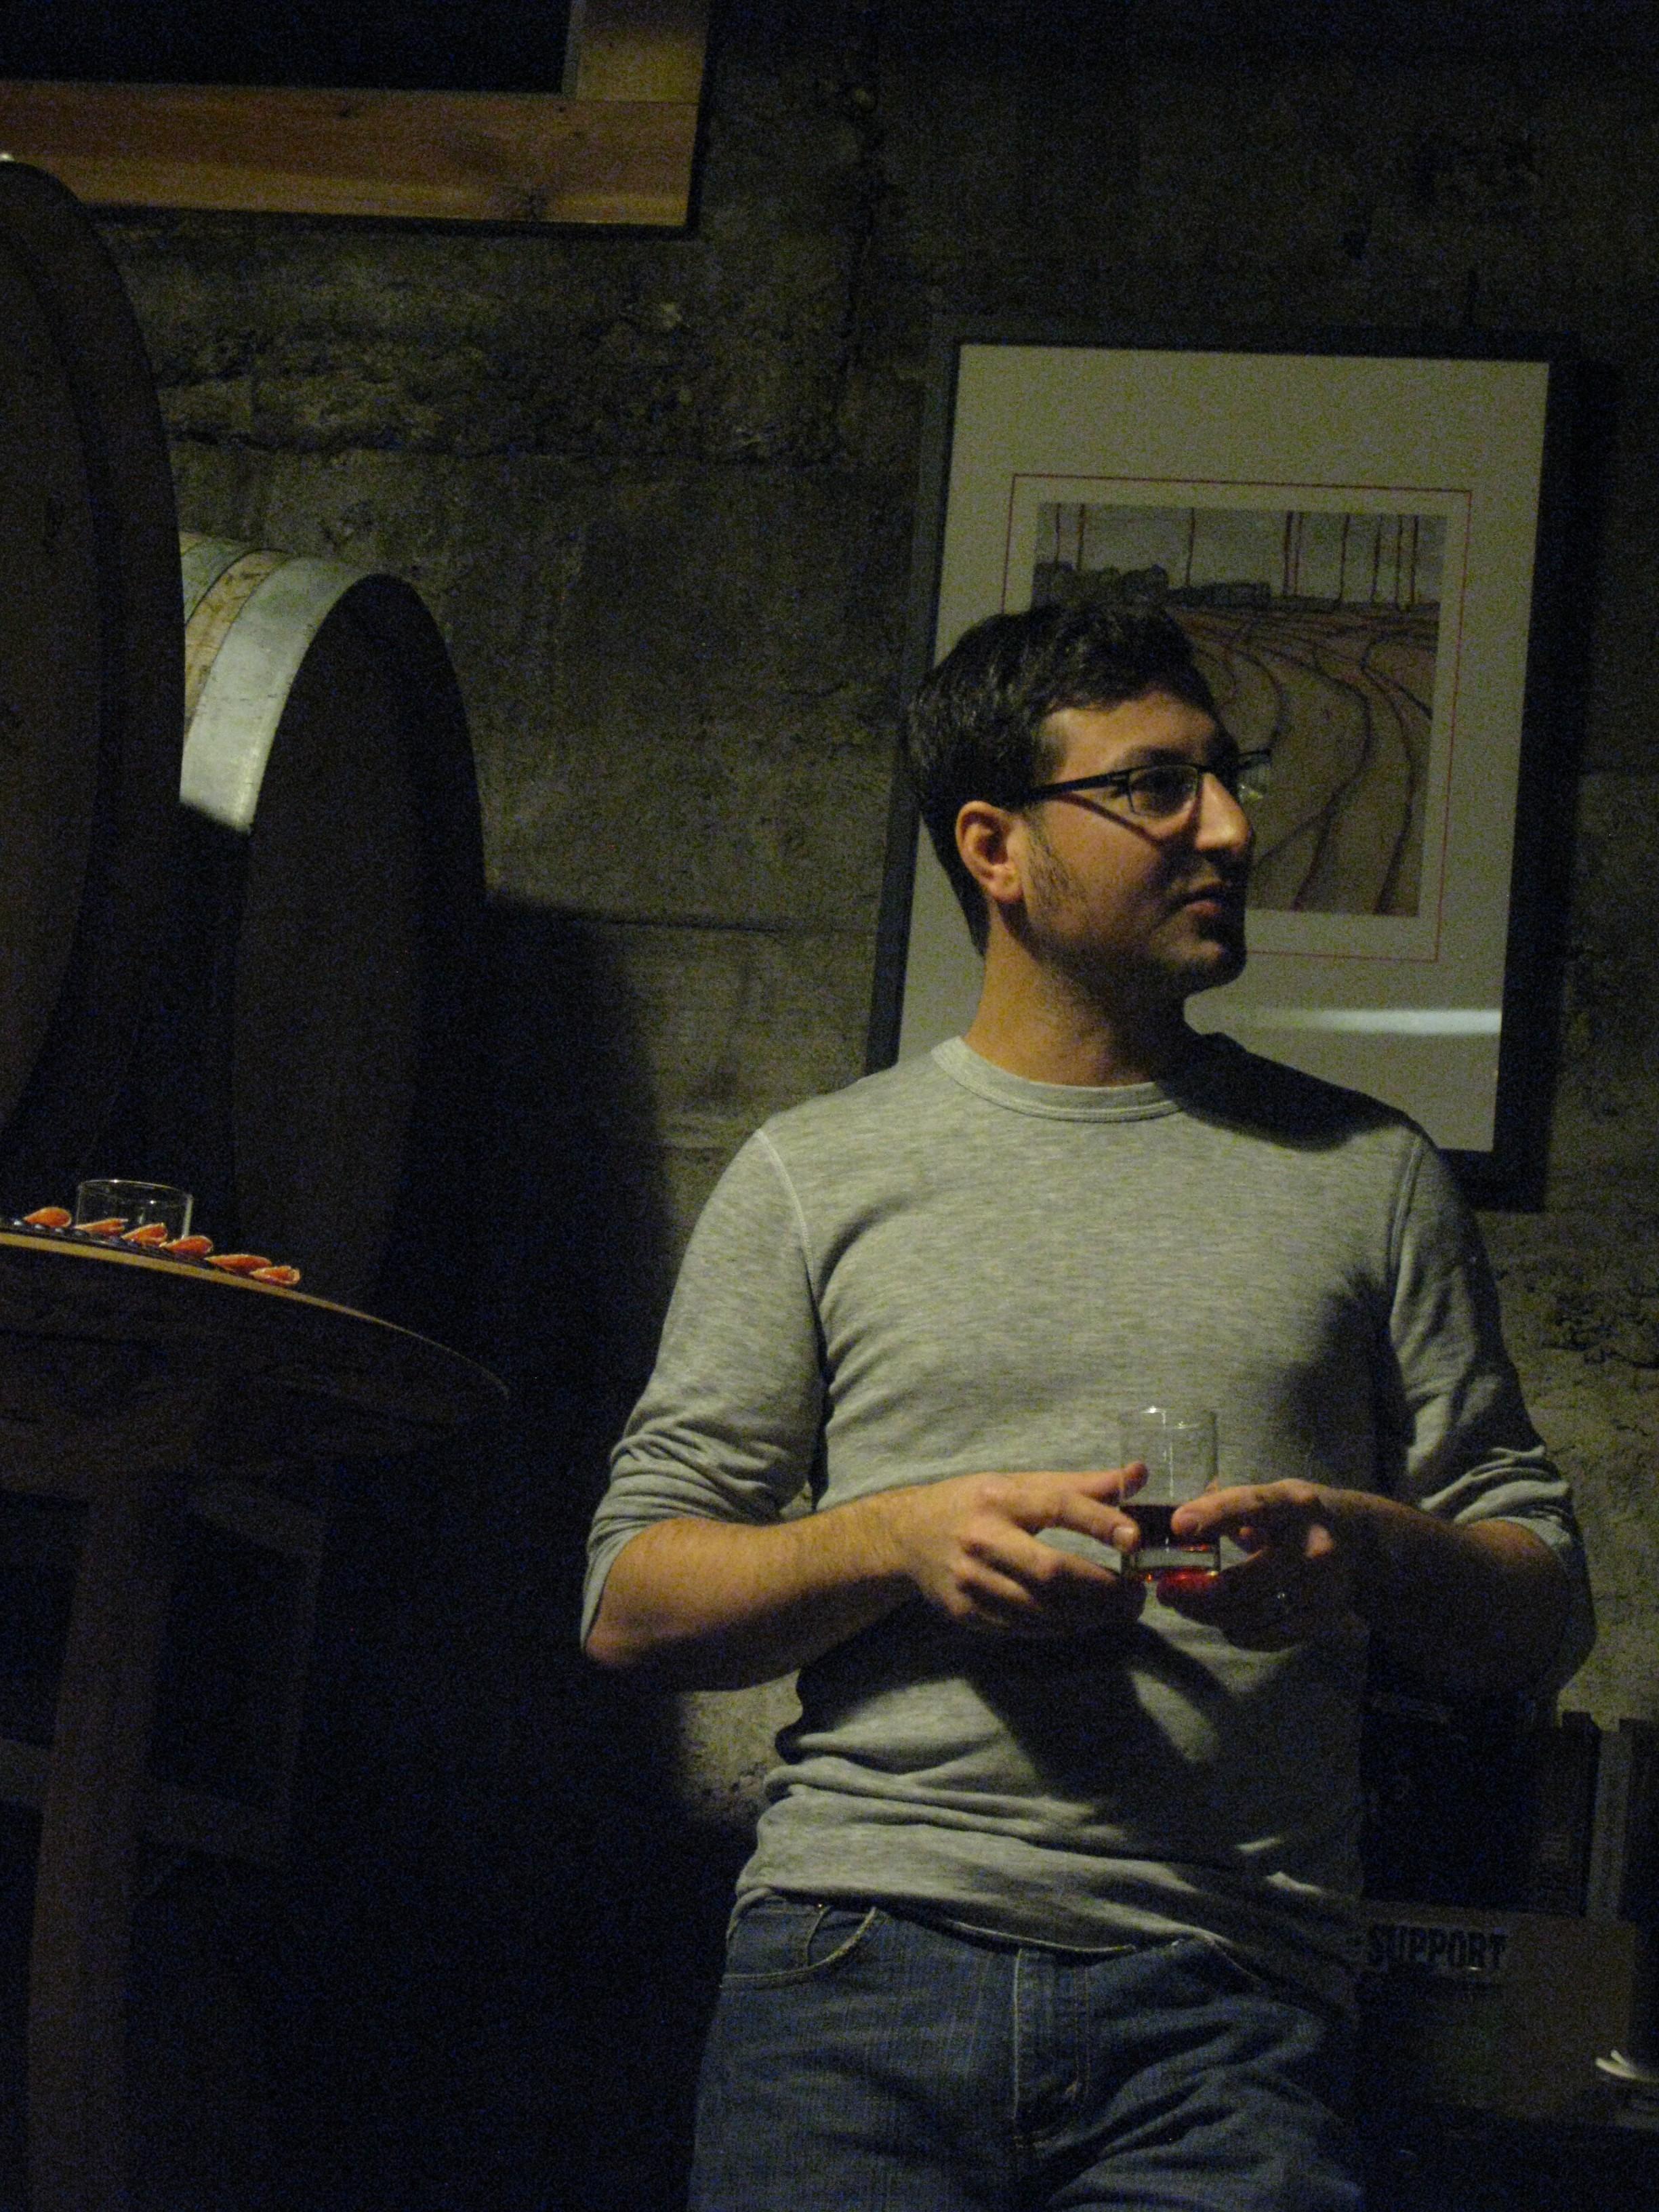 Alex Ganum leading a tasting at Upright Brewing. (FoystonFoto)